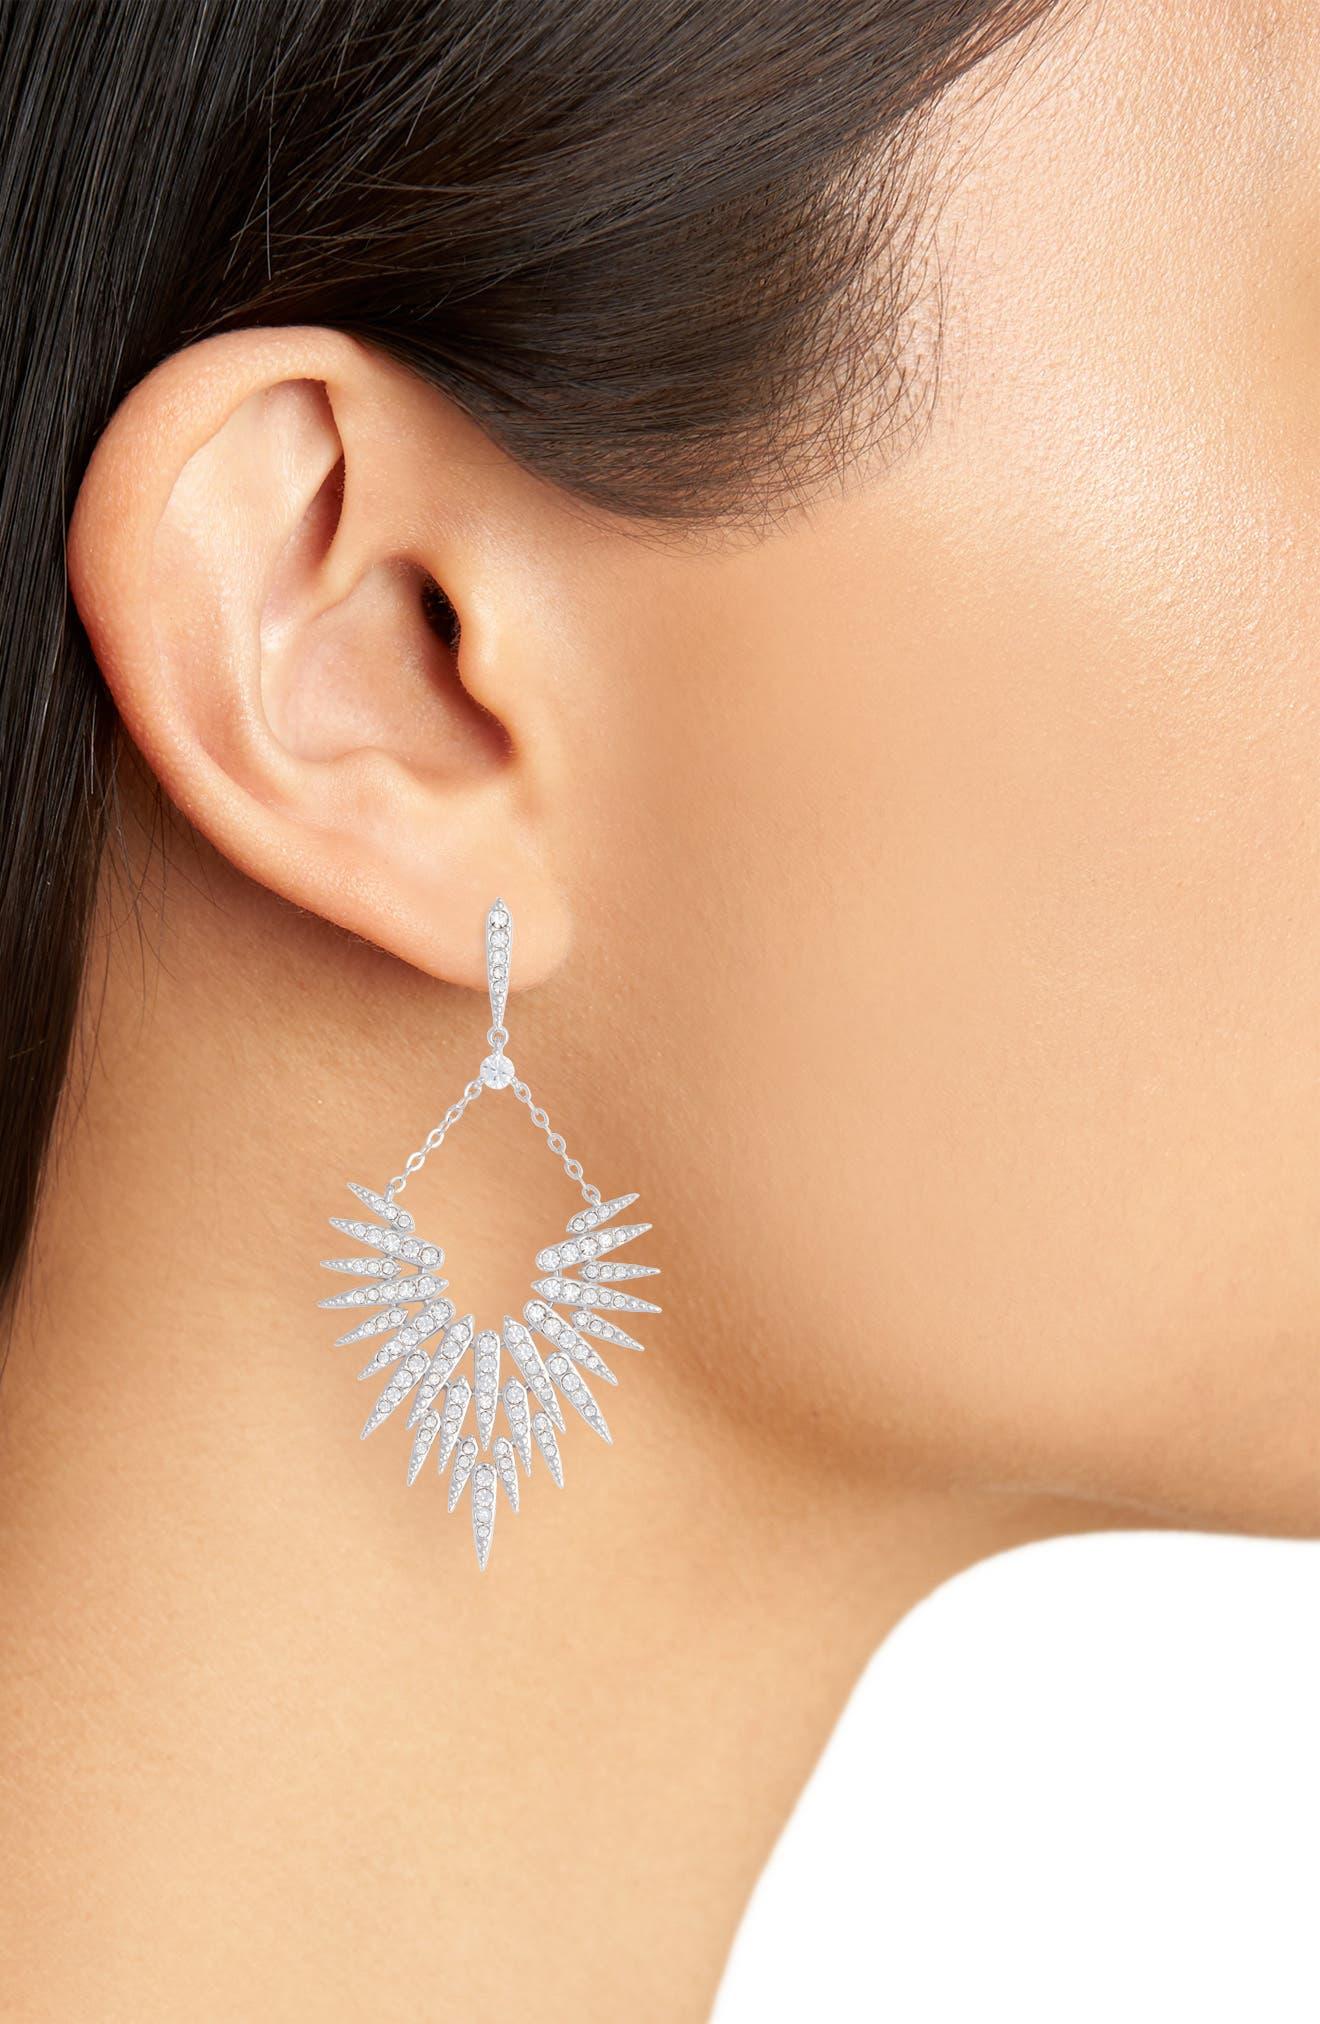 Cubic Zirconia Sunburst Drop Earrings,                             Alternate thumbnail 2, color,                             Silver